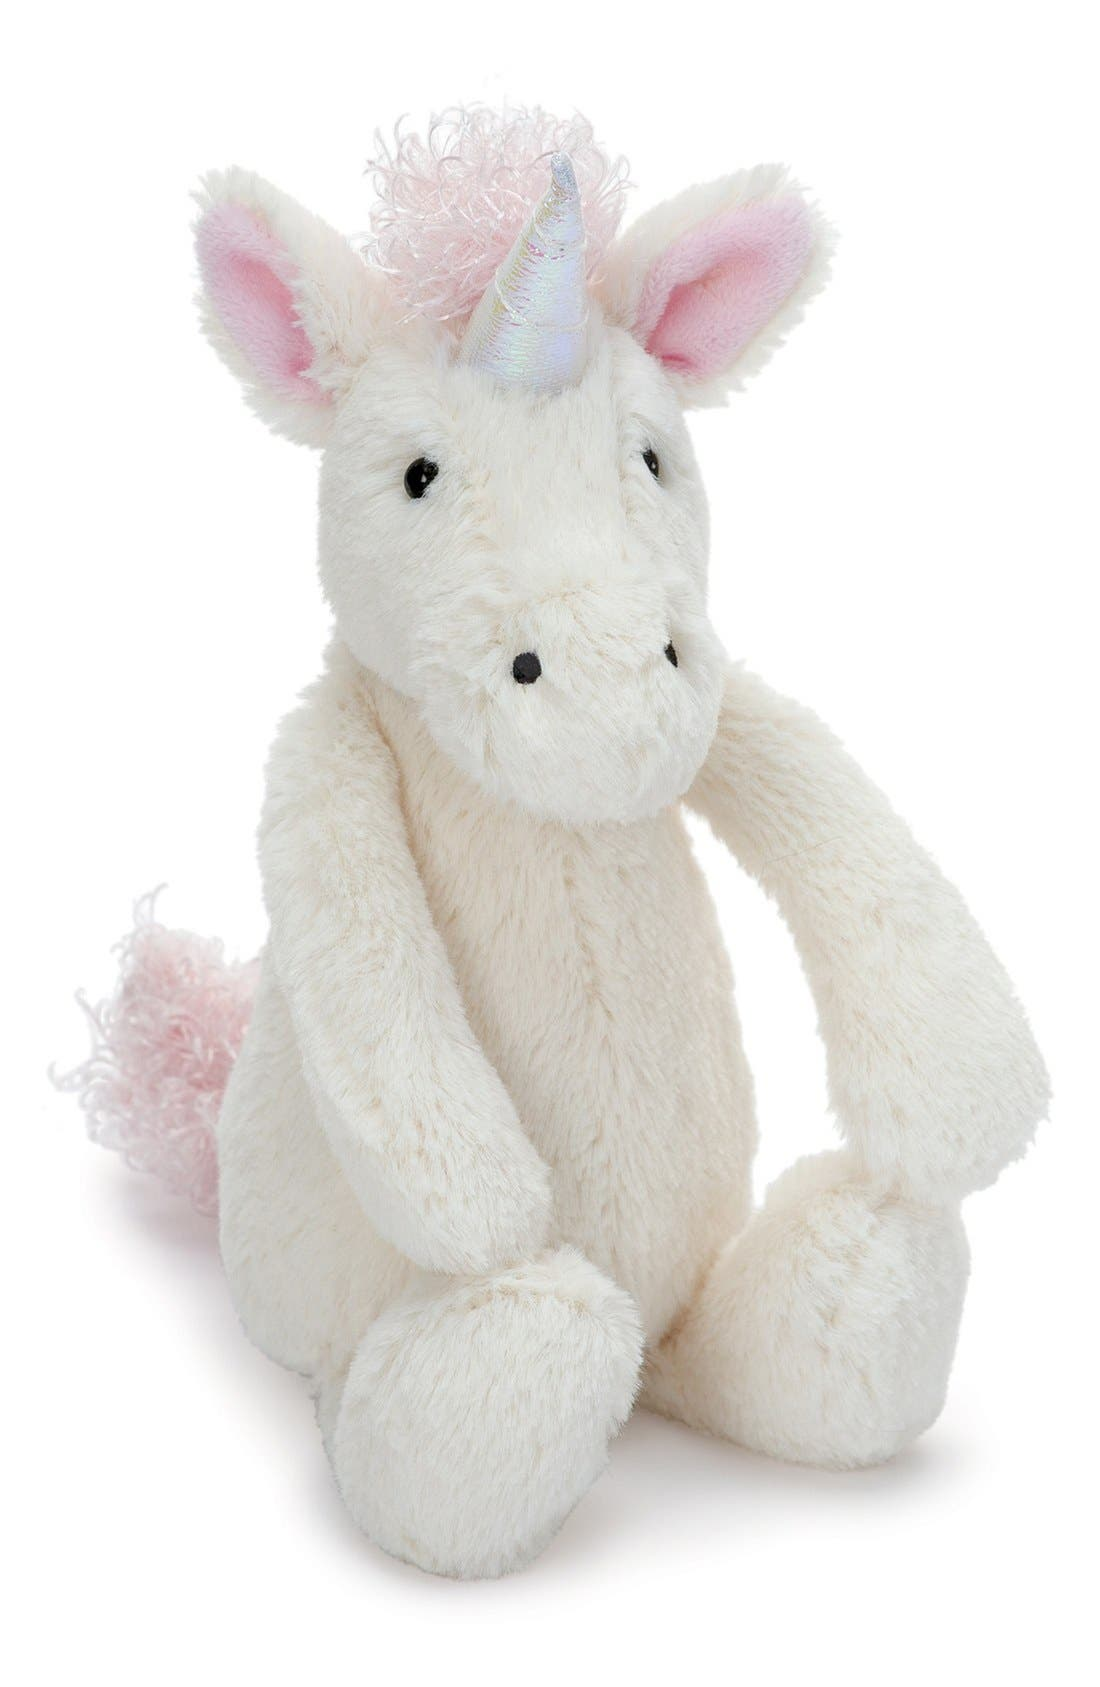 'Small Bashful Unicorn' Stuffed Animal,                             Main thumbnail 1, color,                             Cream